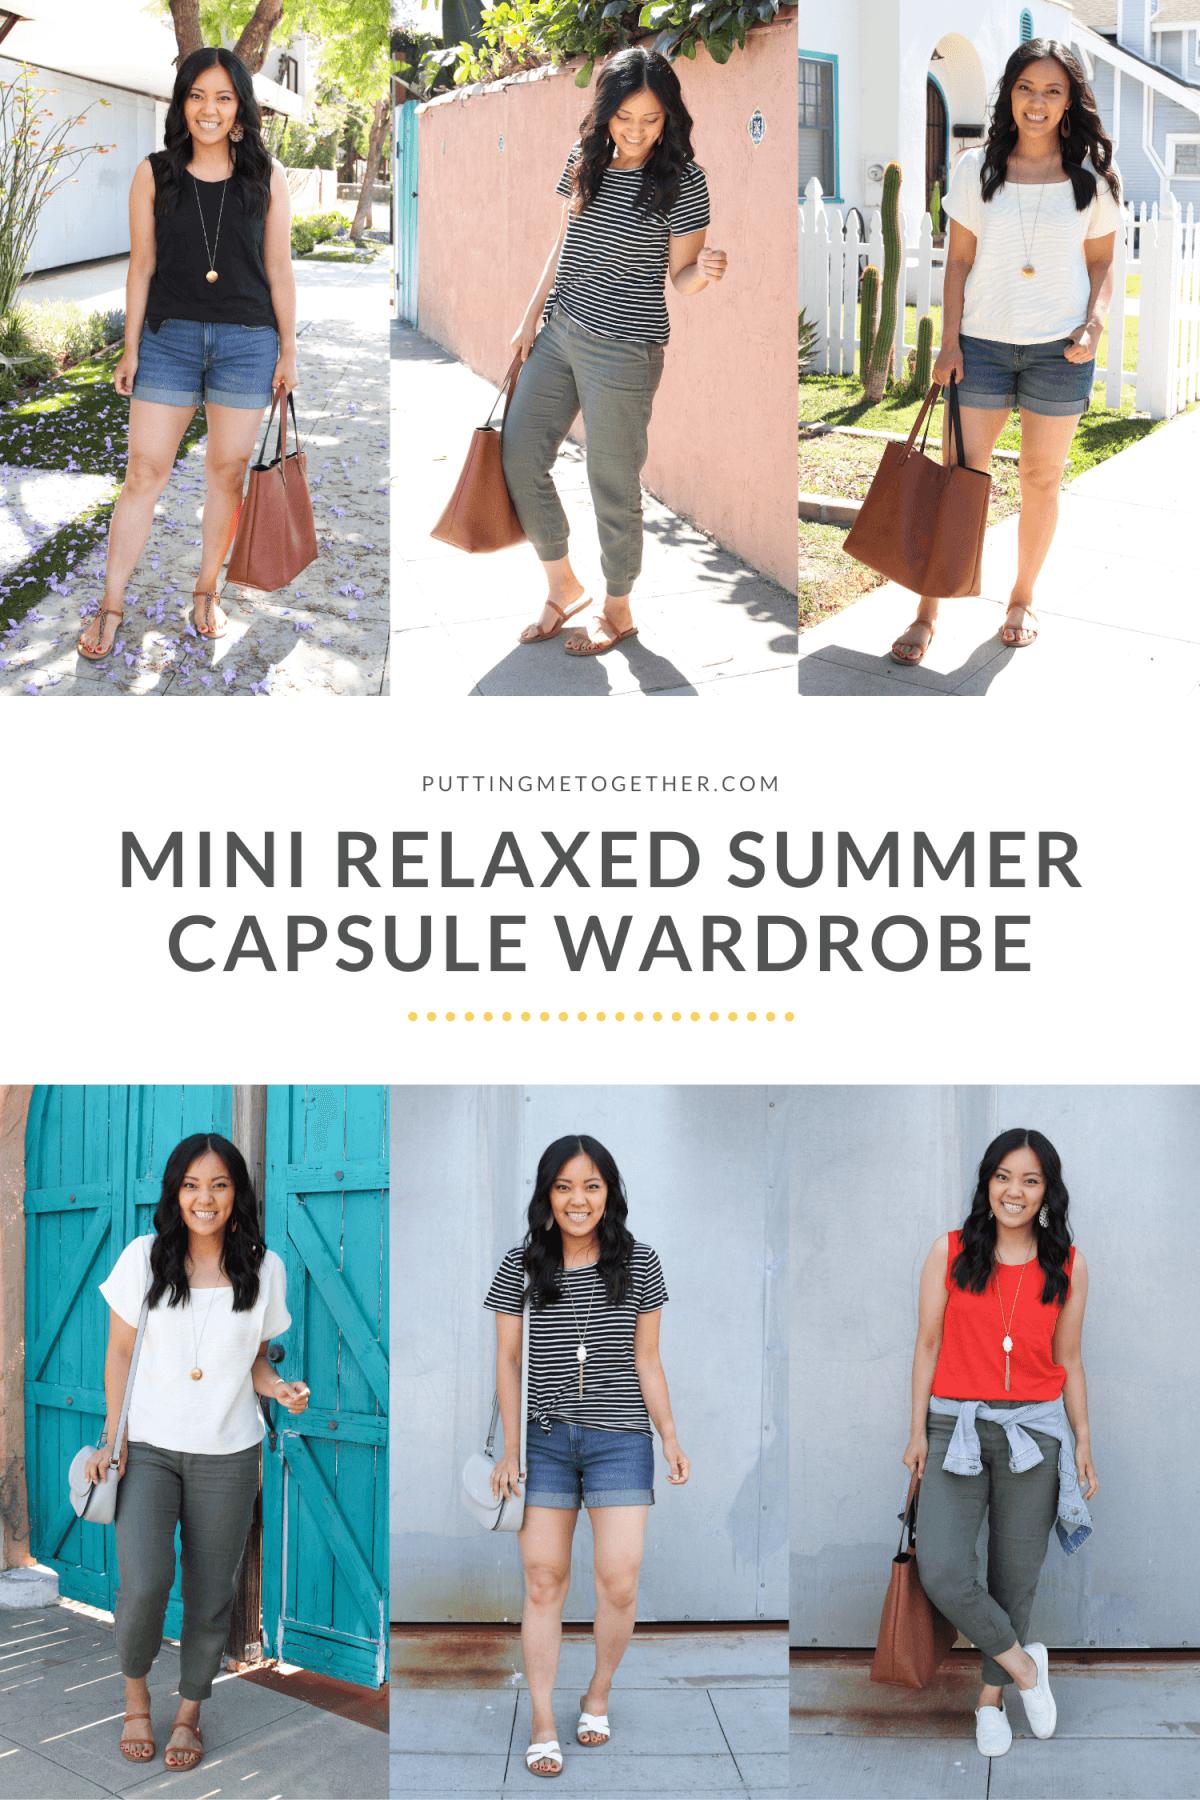 mini relaxed summer capsule wardrobe